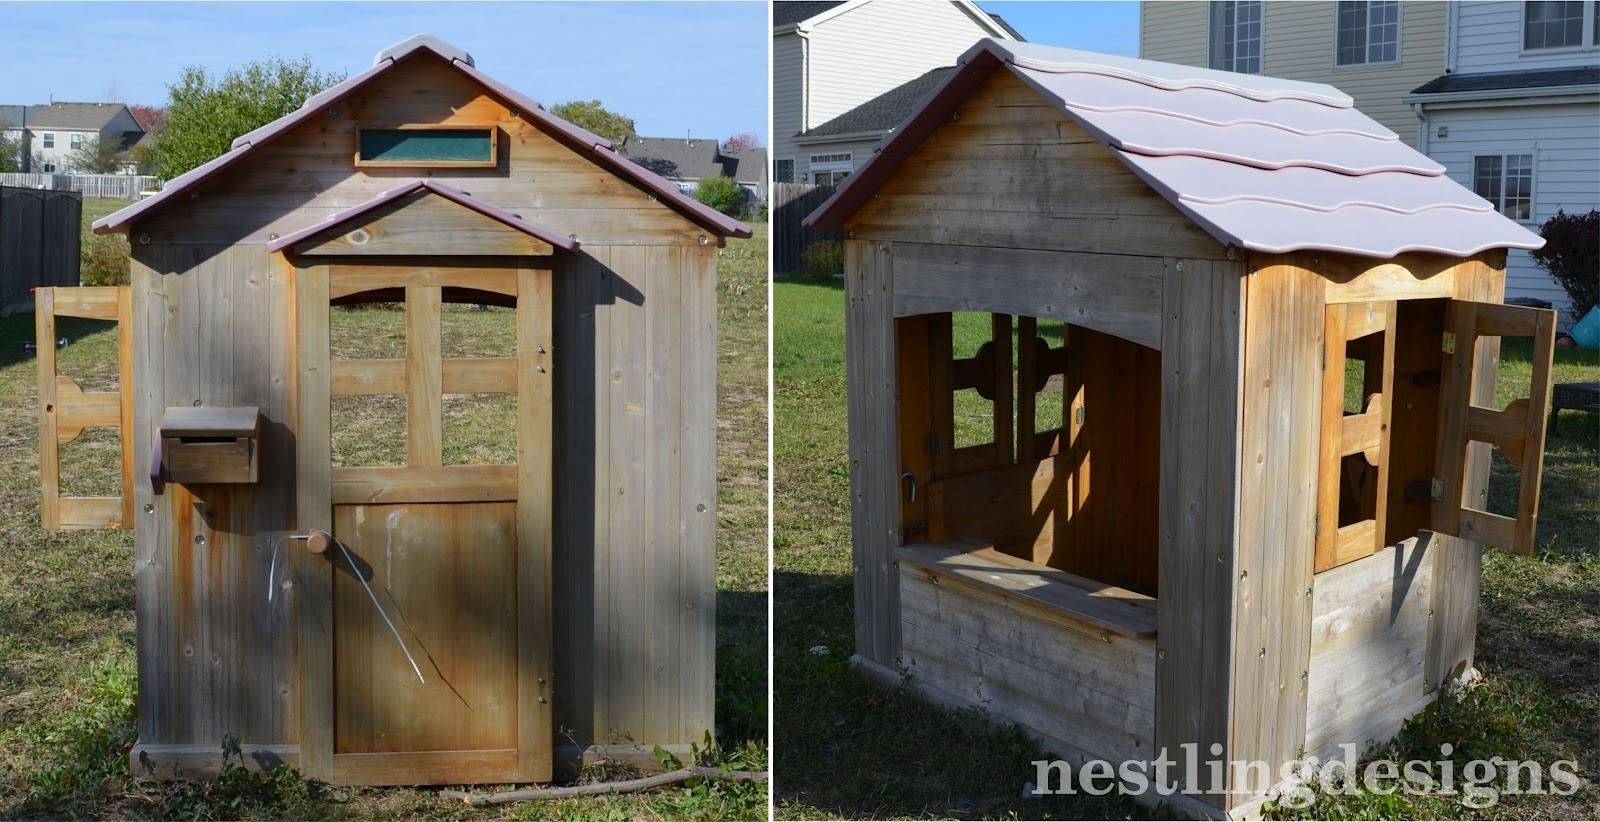 nestling diy haunted play house. Black Bedroom Furniture Sets. Home Design Ideas